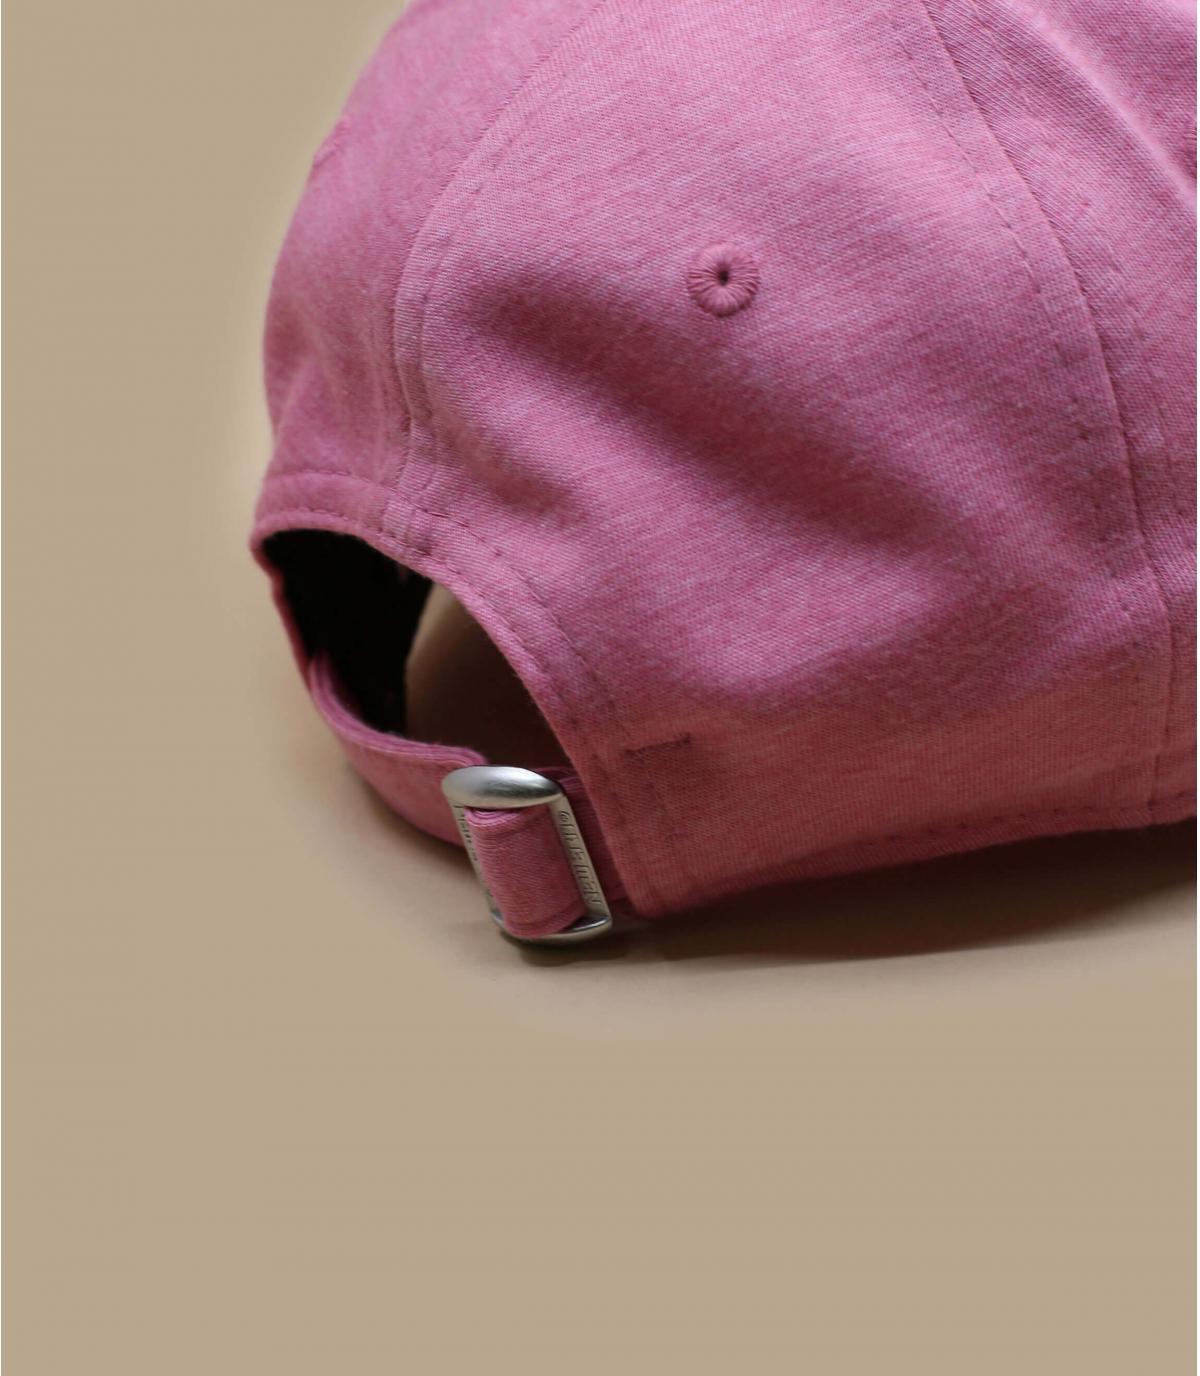 Details Wmn Jersey Ess 940 NY pink - afbeeling 4